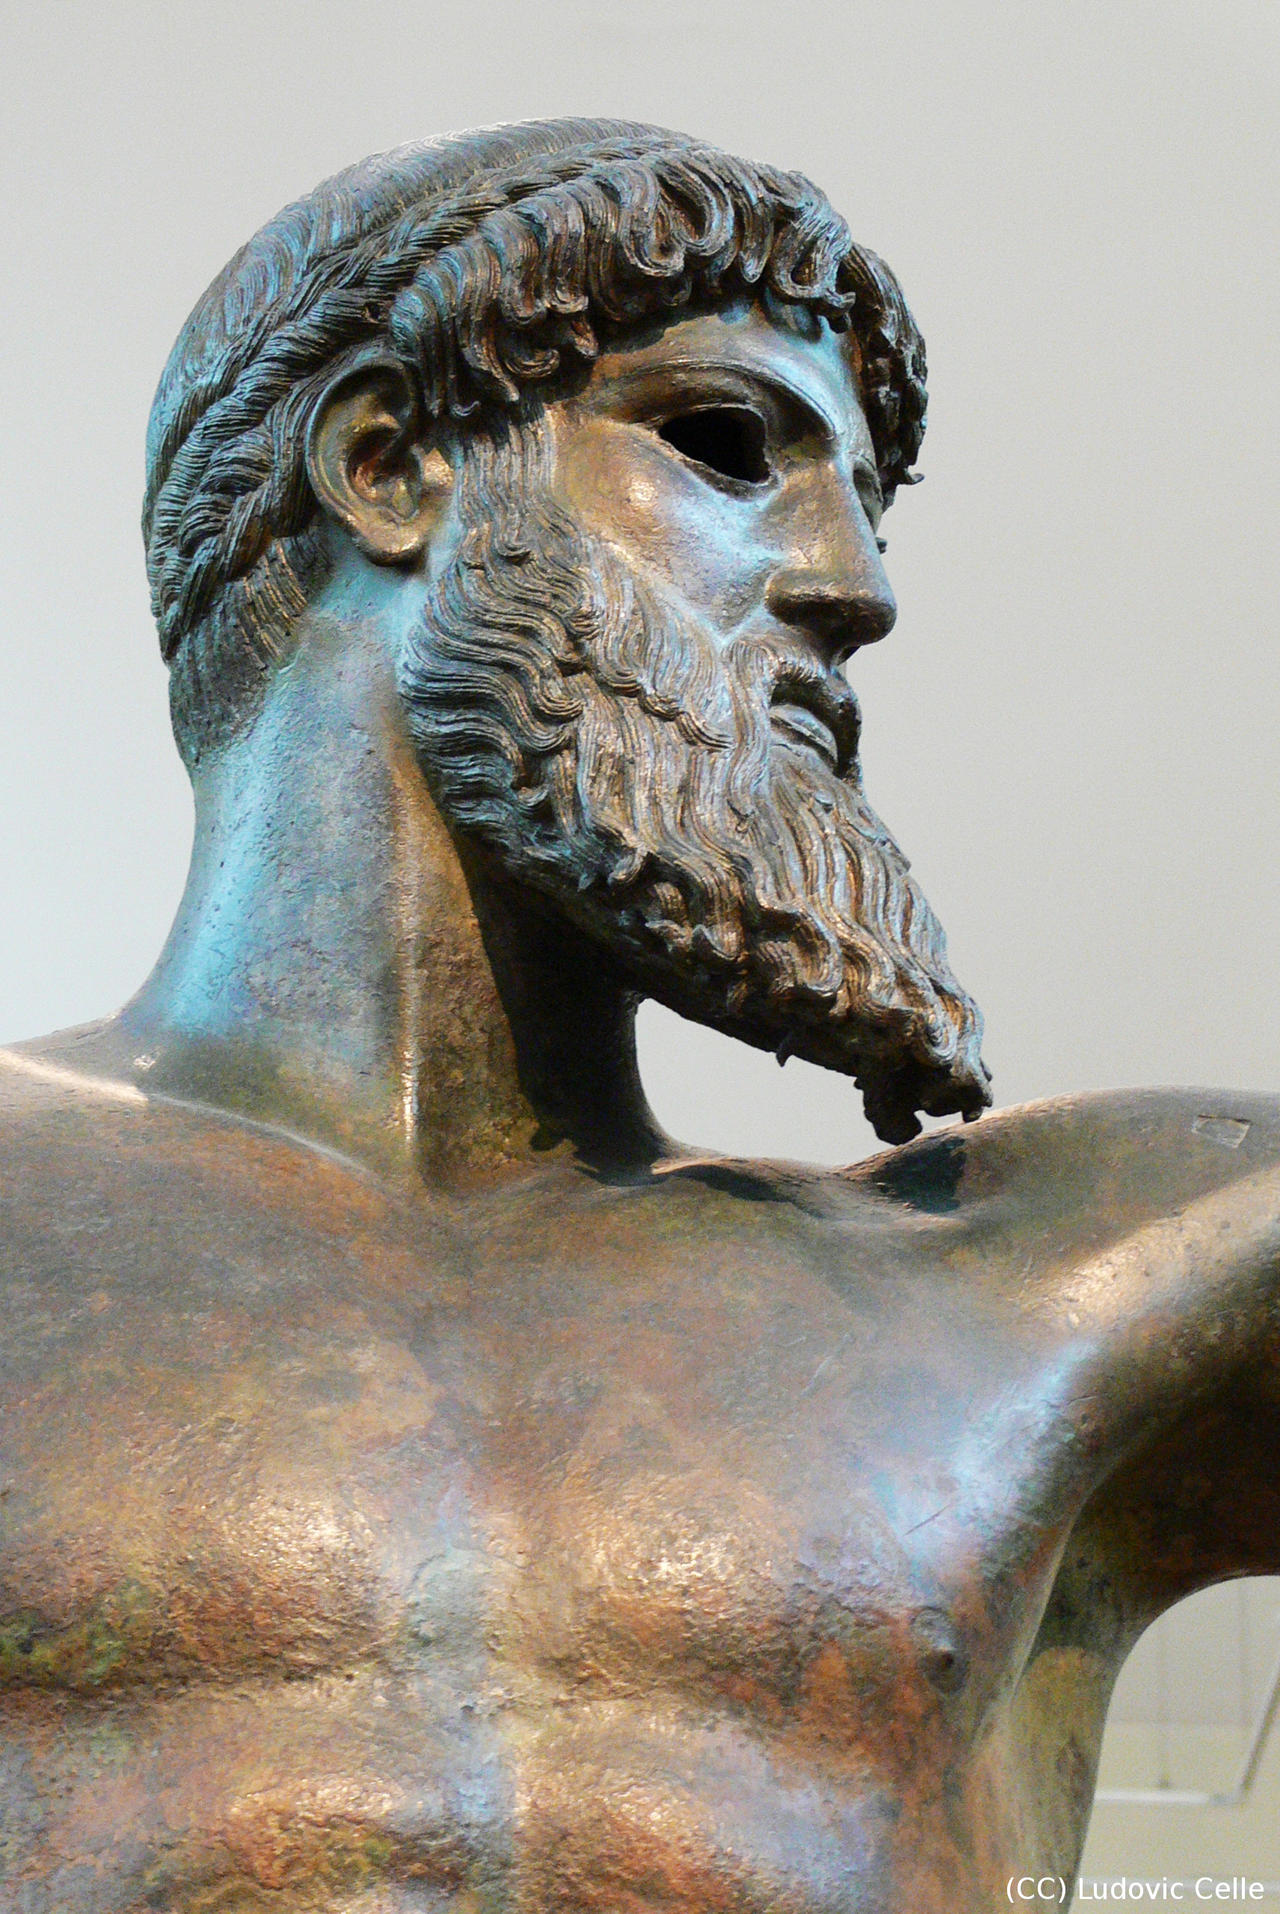 Greece - Statue of Zeu...